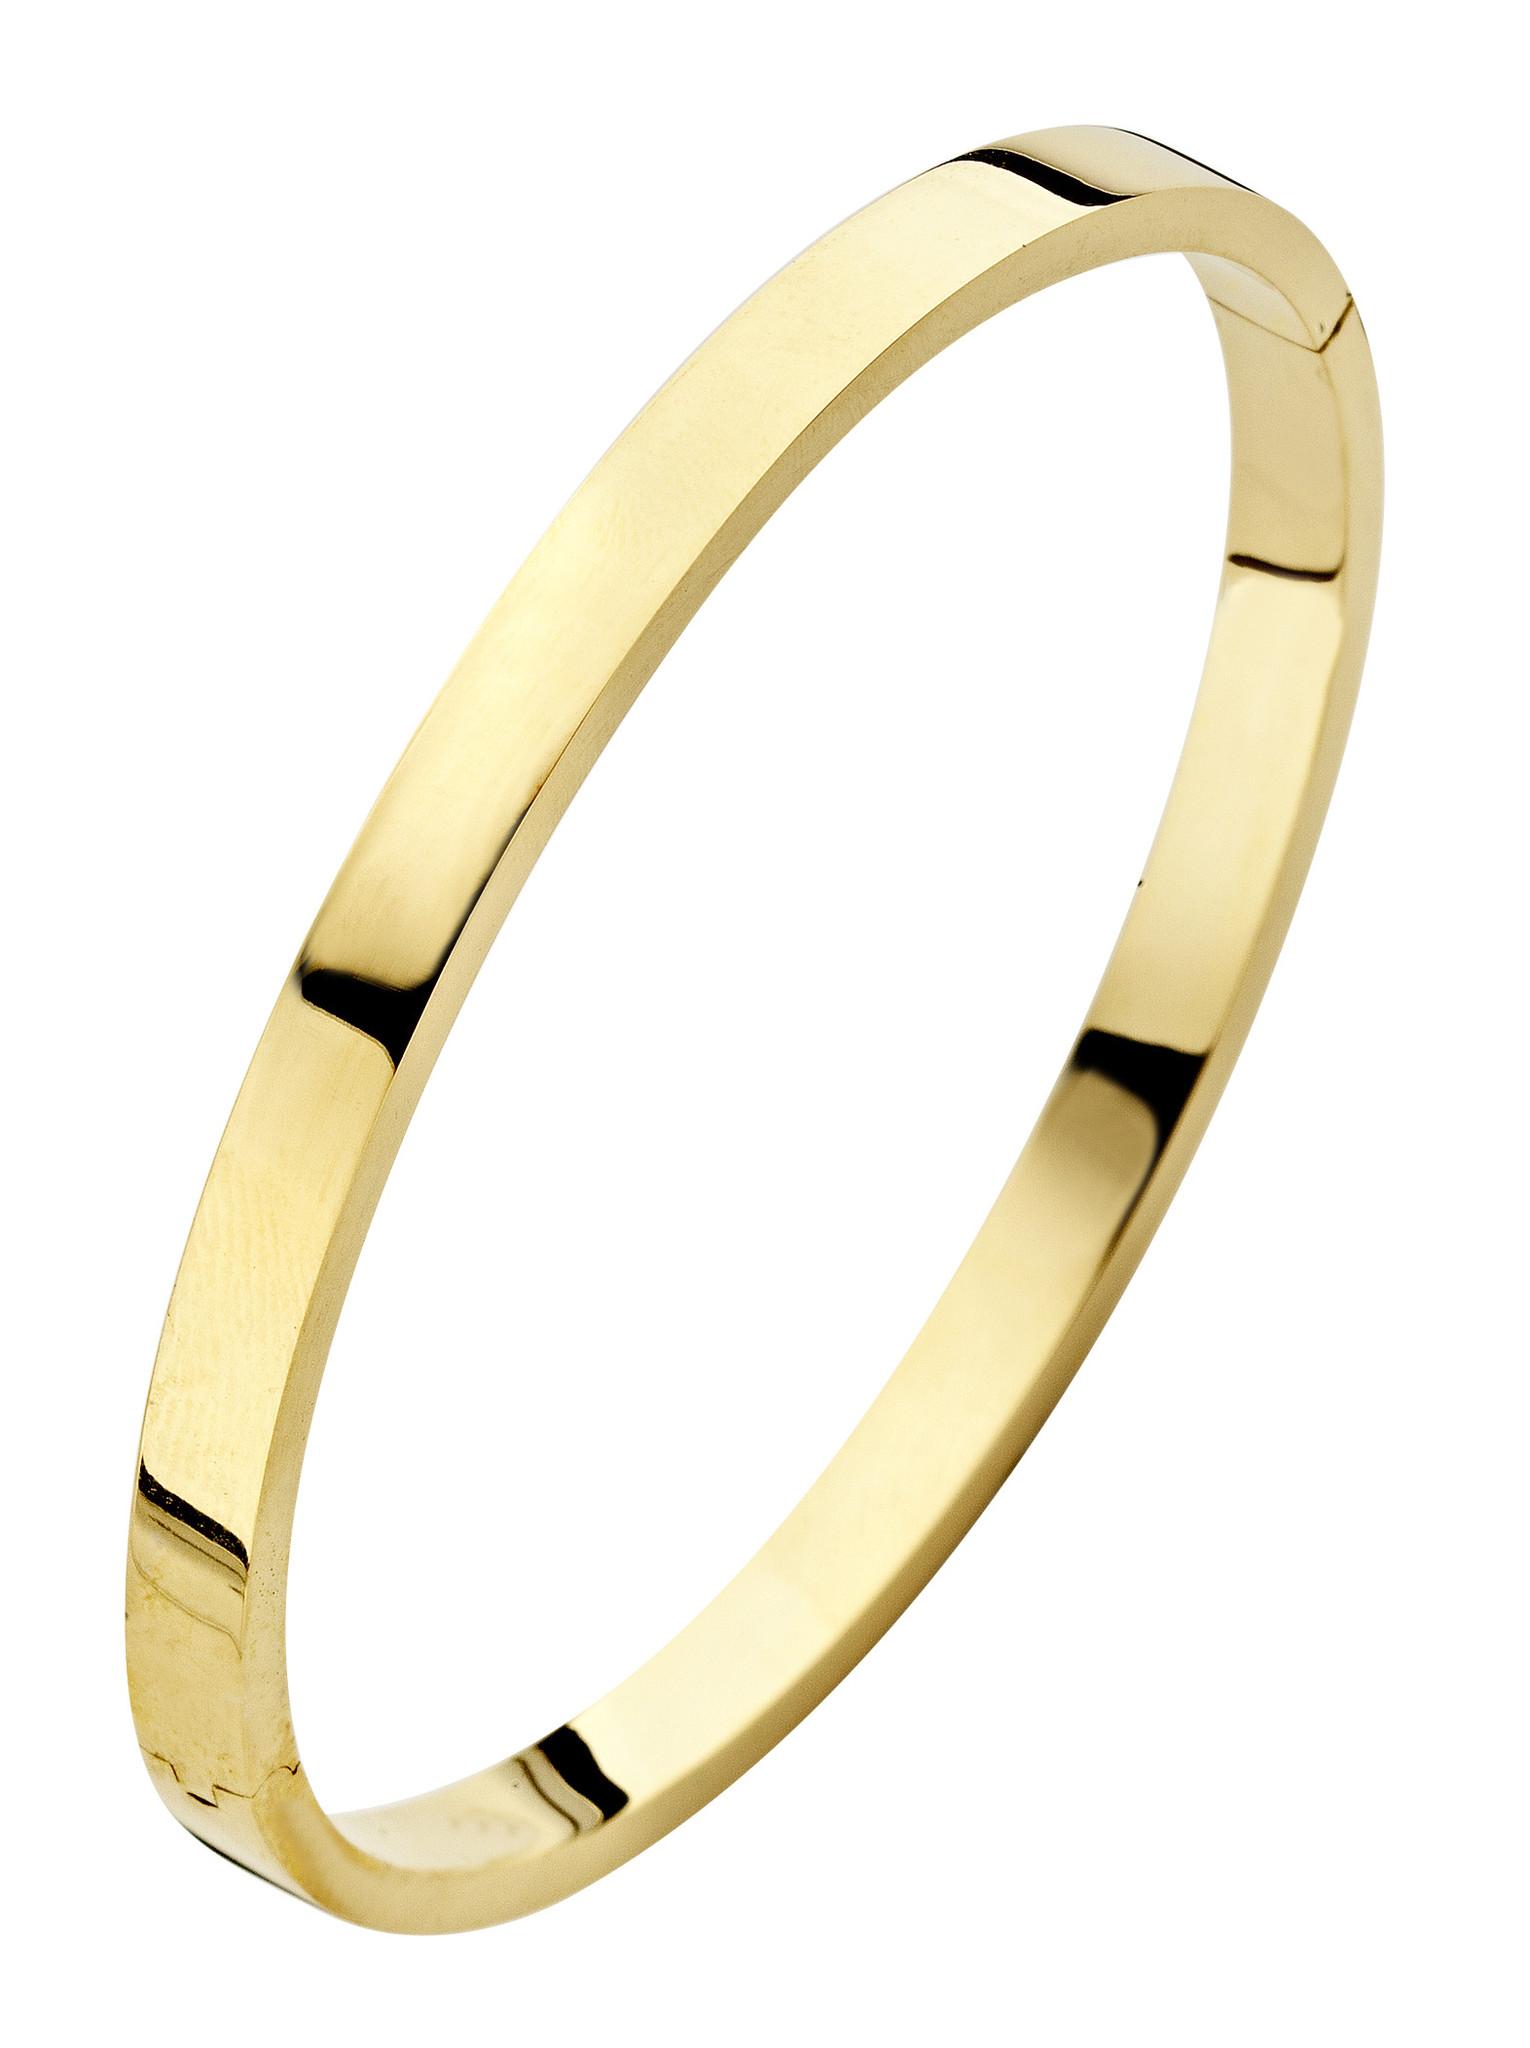 14 karaat geelgouden armband - Recht 5 mm - Fjory - Slavenarmband-1